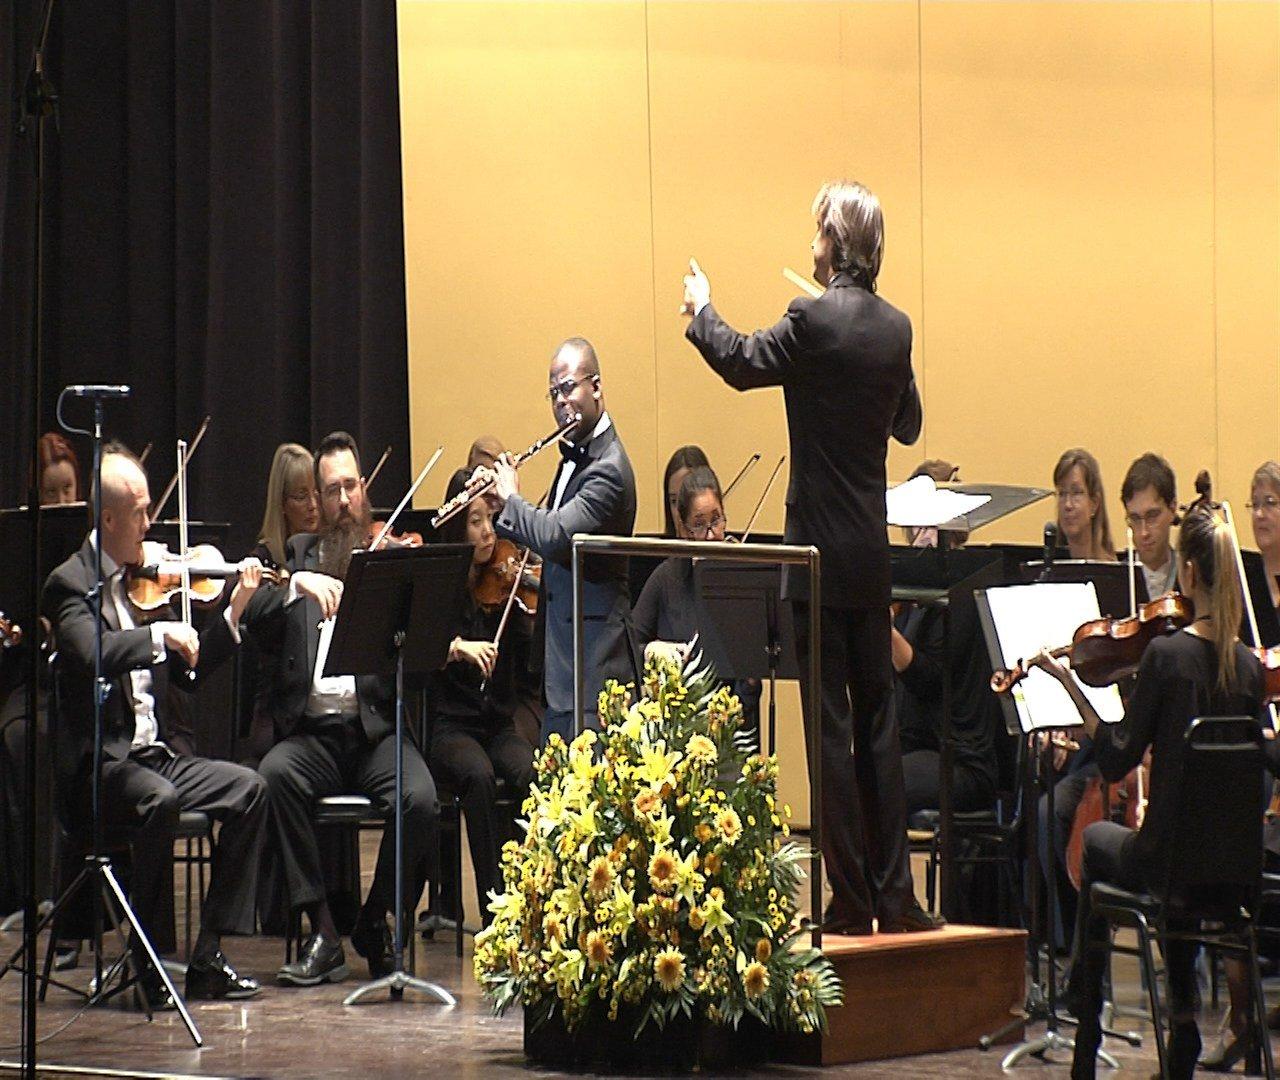 Eire Philharmonic